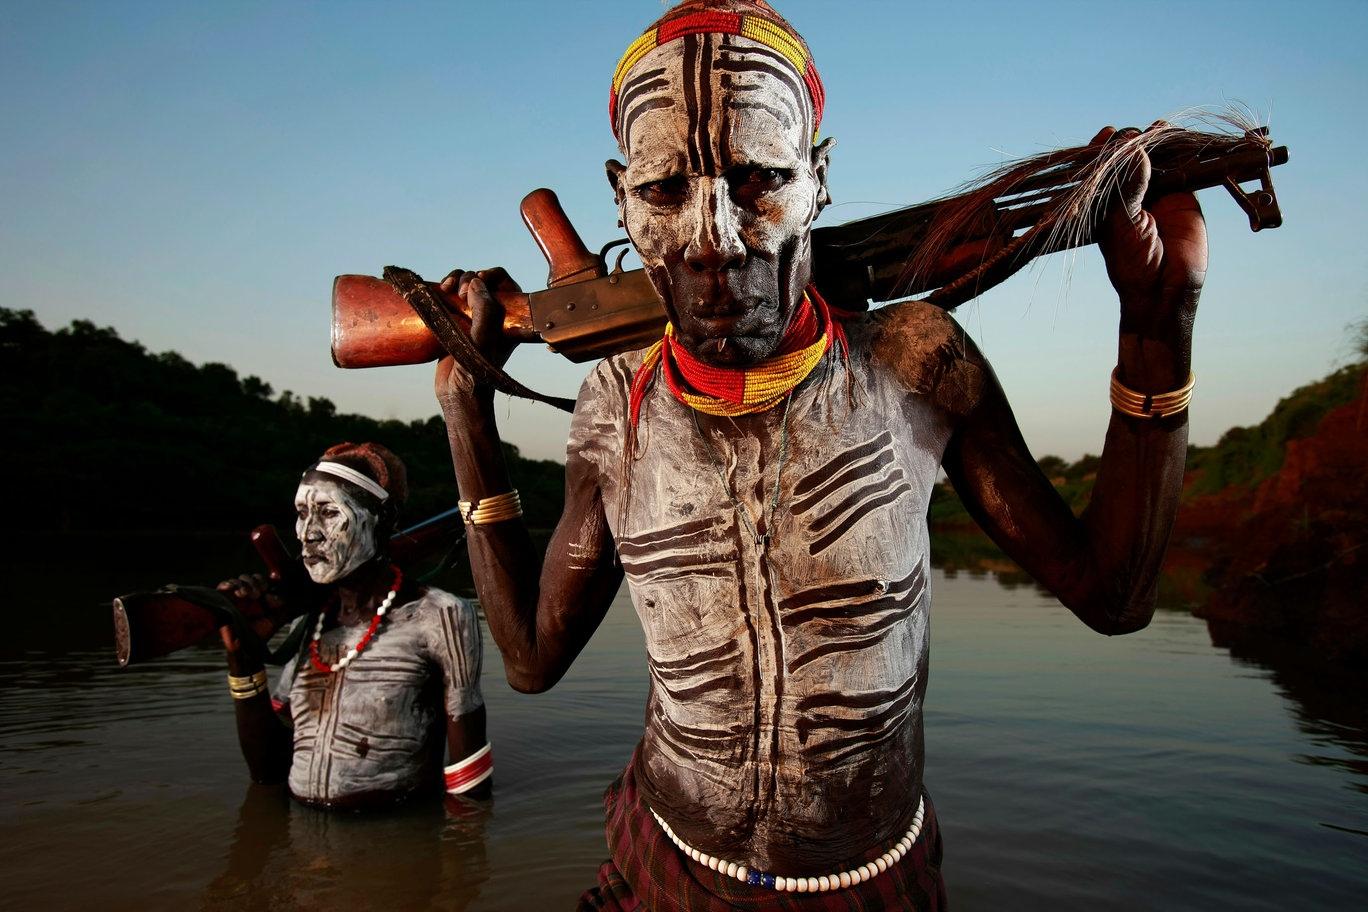 goliy-aborigen-s-kalashnikovim-foto